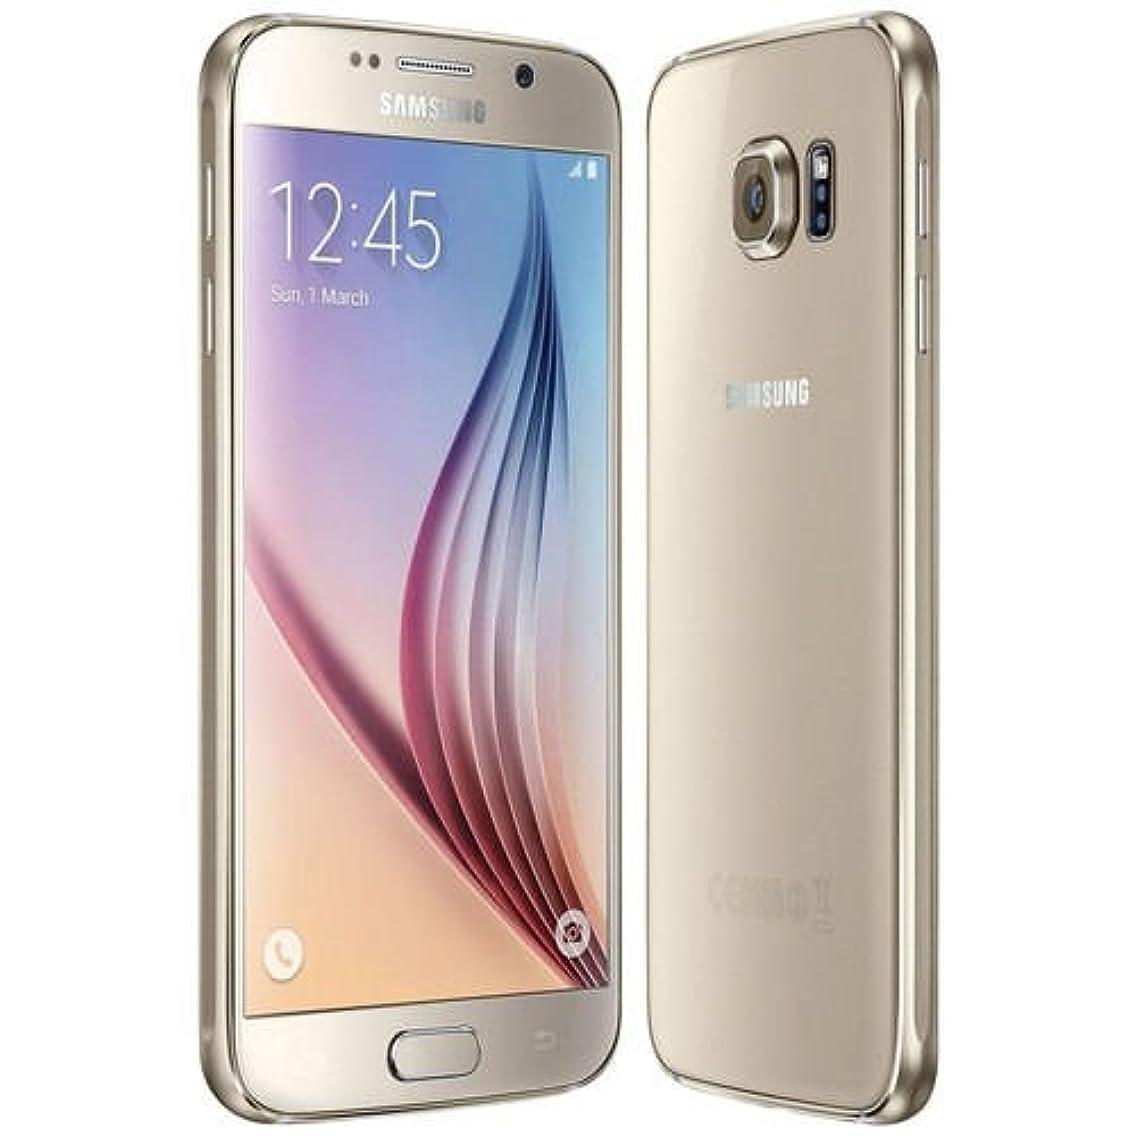 Samsung Galaxy S6 G920T GSM Unlocked (Gold, 64GB)